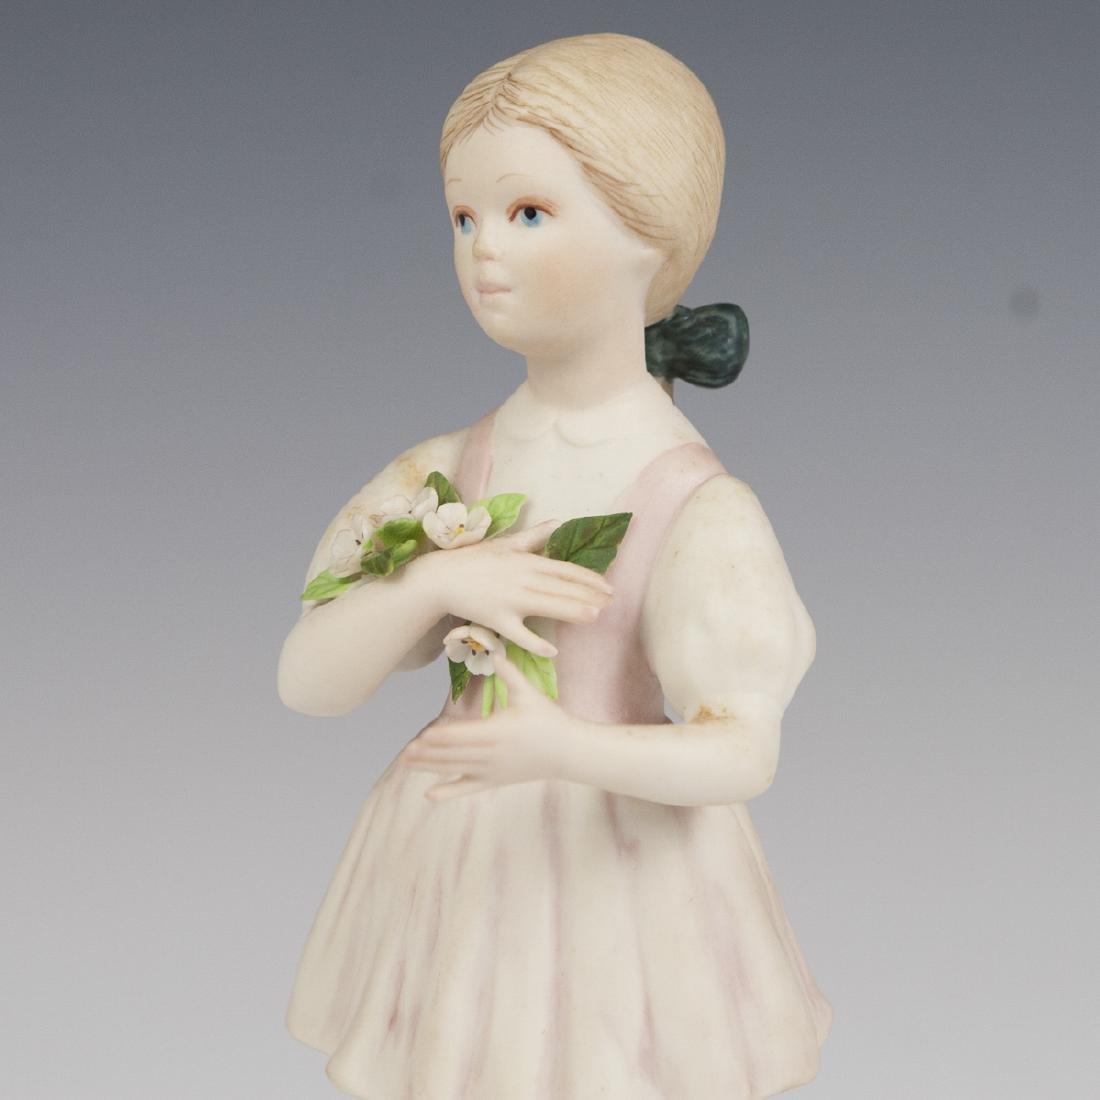 Sybis Bisque Porcelain Figurine - 2